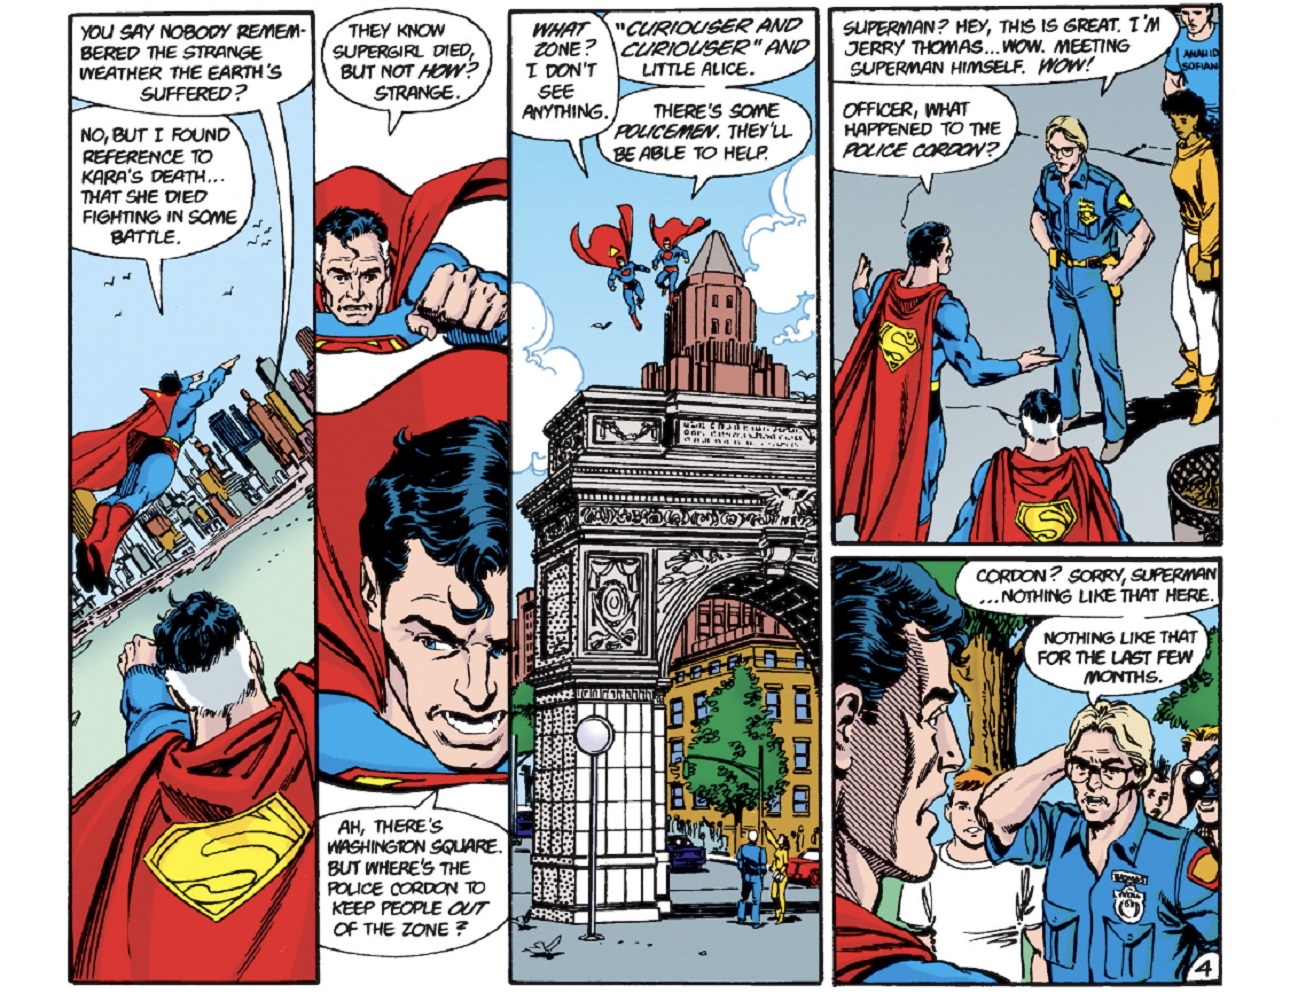 crisis-on-infinite-earths-superman.jpg